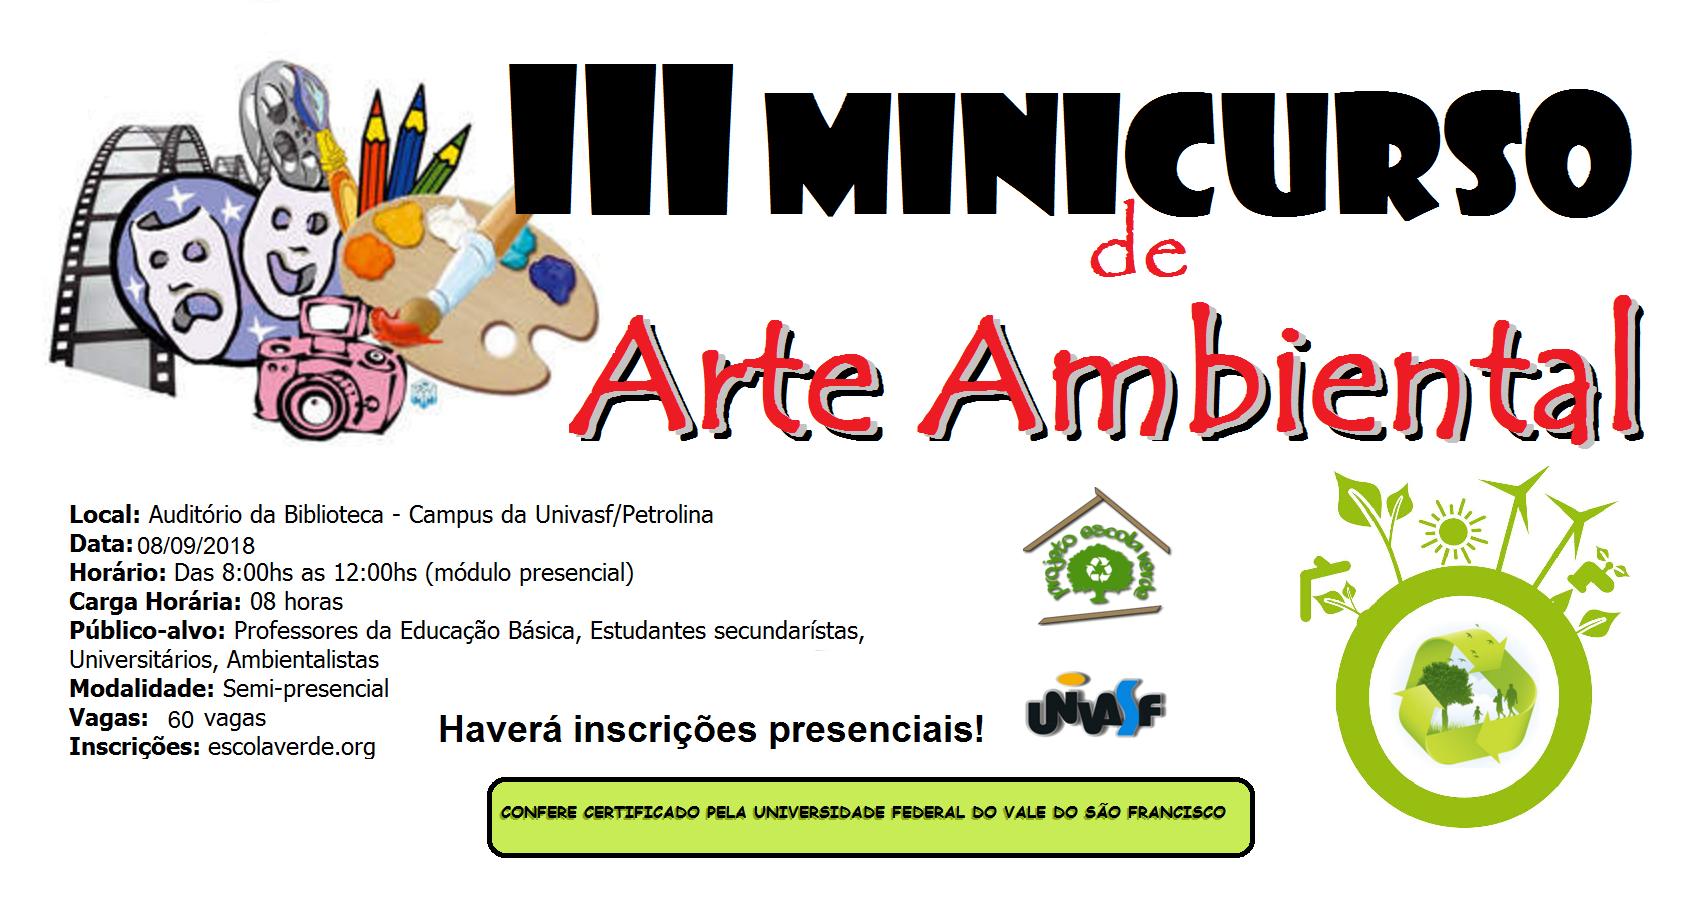 banner do III minicurso de arte ambiental